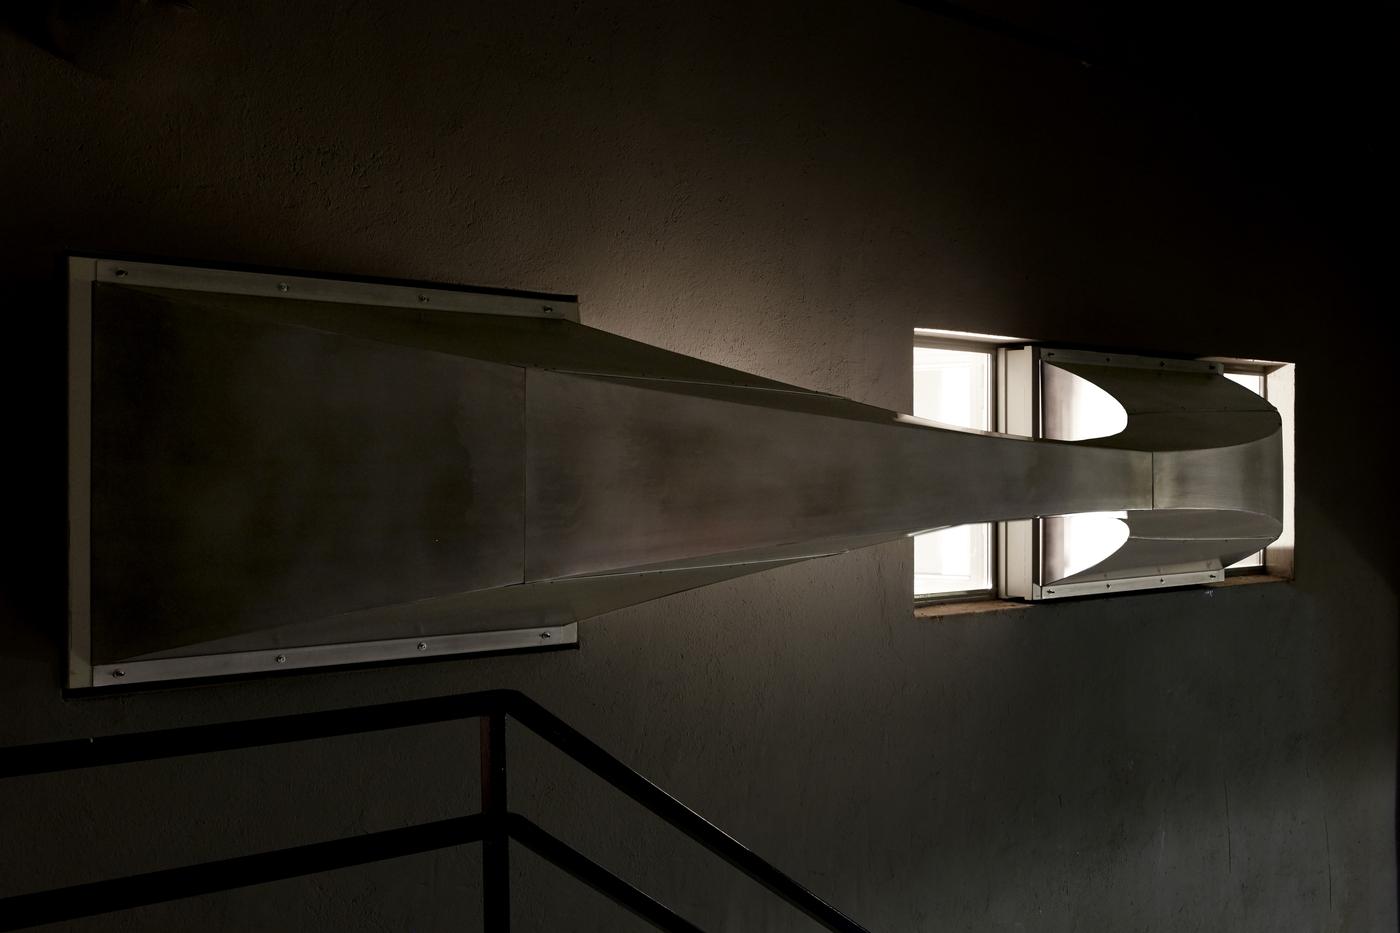 Eccentrica Immaginaria, Photo © Bart Herreman